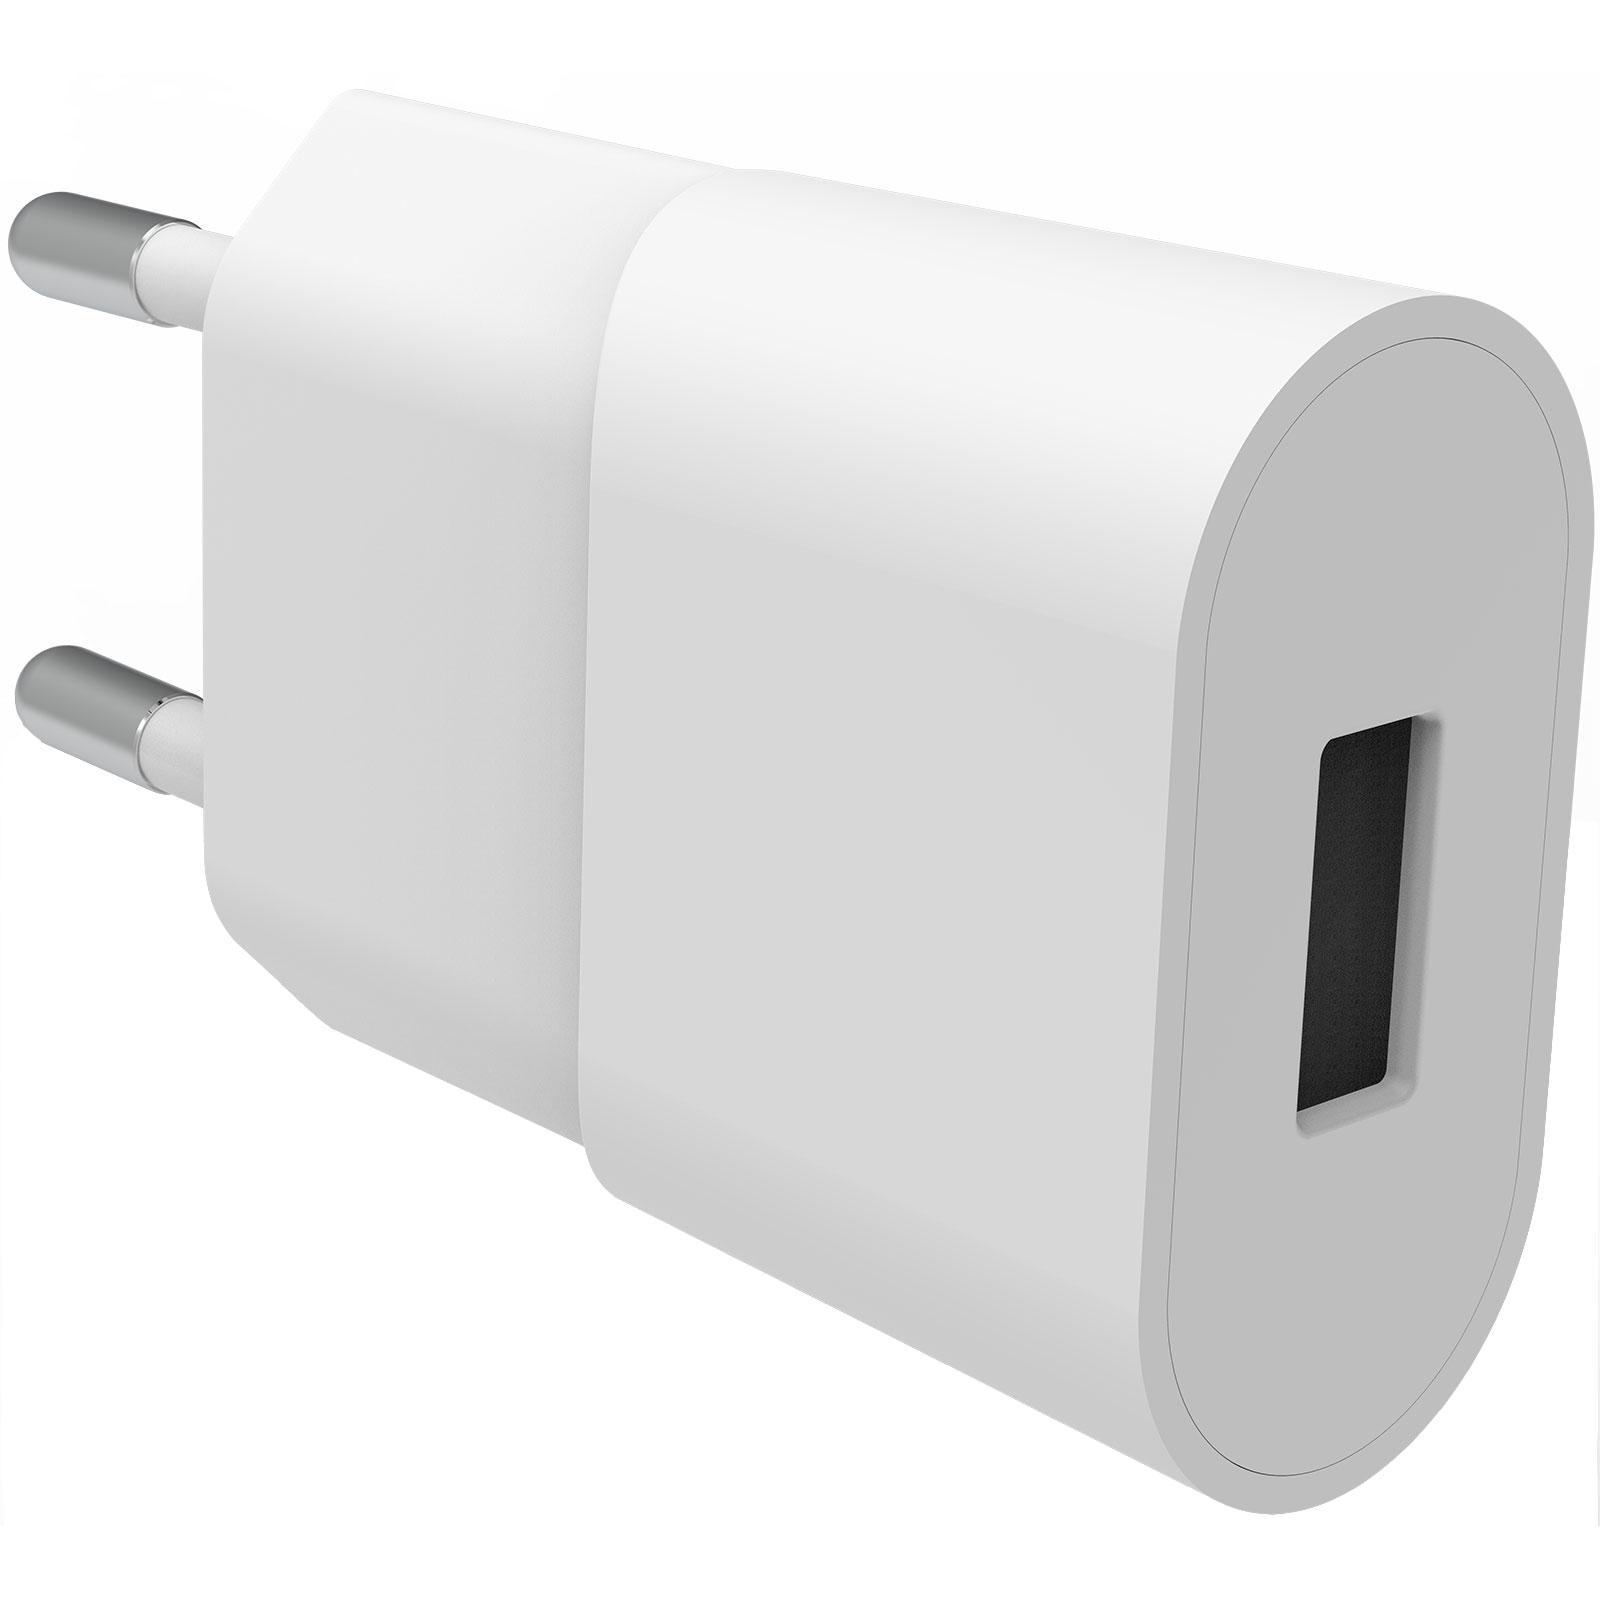 USB Wall Charger 1A hvit